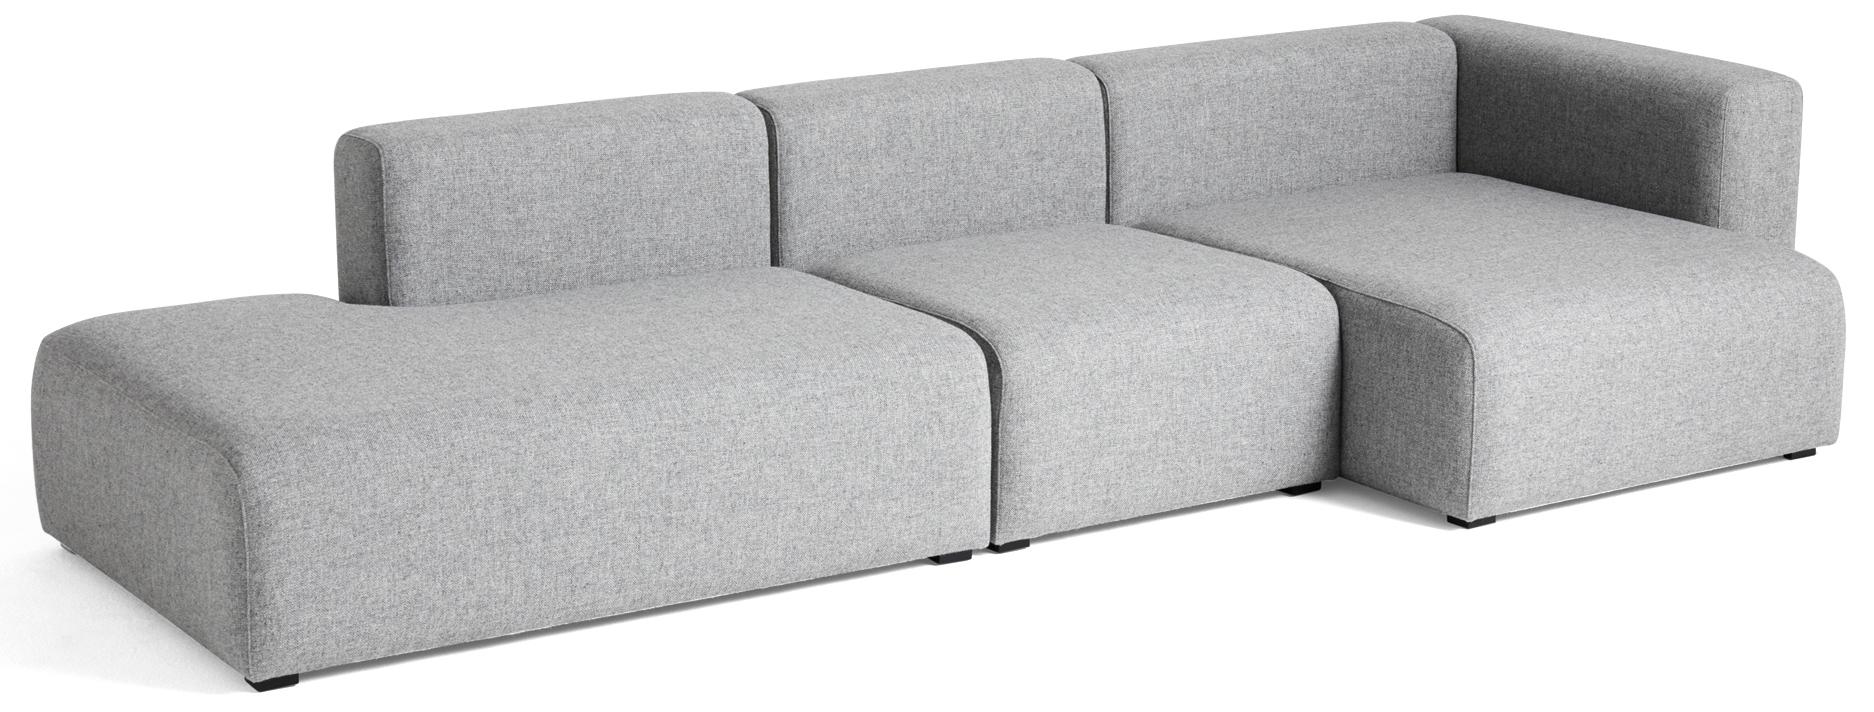 hay mags modular sofas. Black Bedroom Furniture Sets. Home Design Ideas